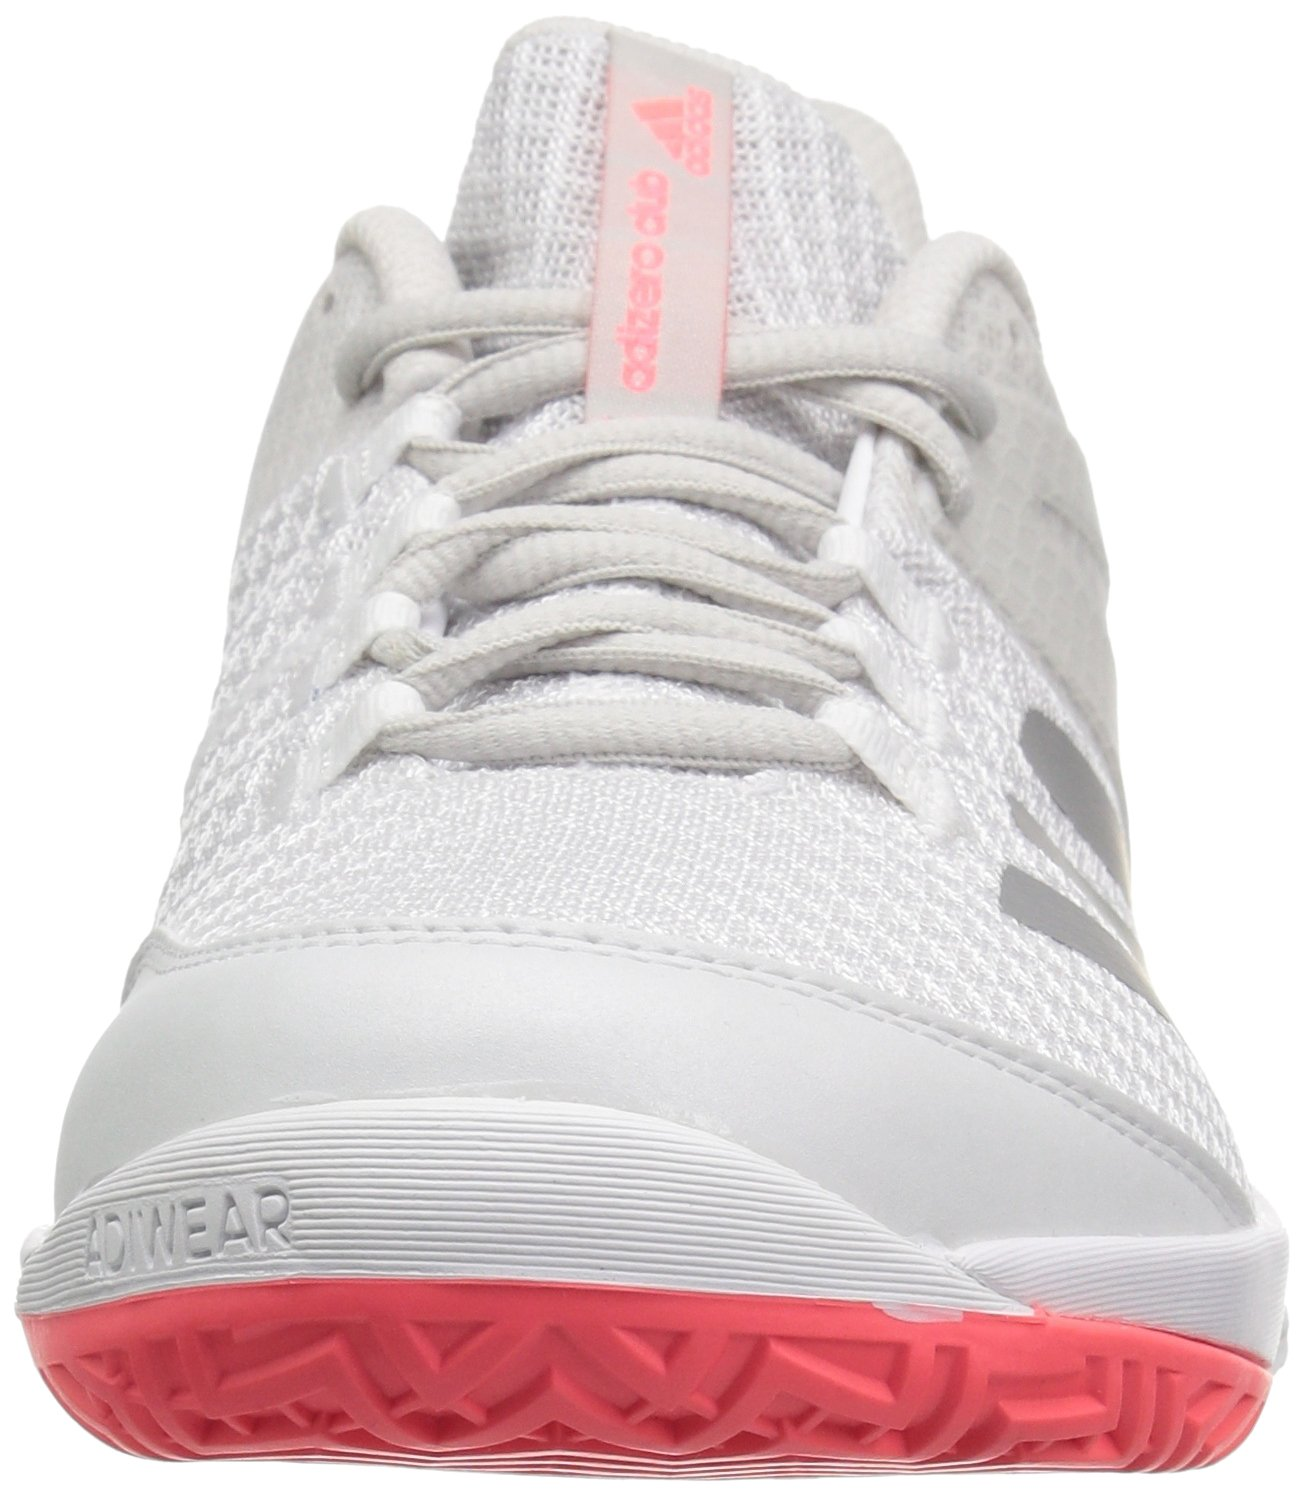 adidas Women's Adizero Club 2 Tennis Shoe B077X4QW77 7.5 B(M) US|White/Matte Silver/Grey